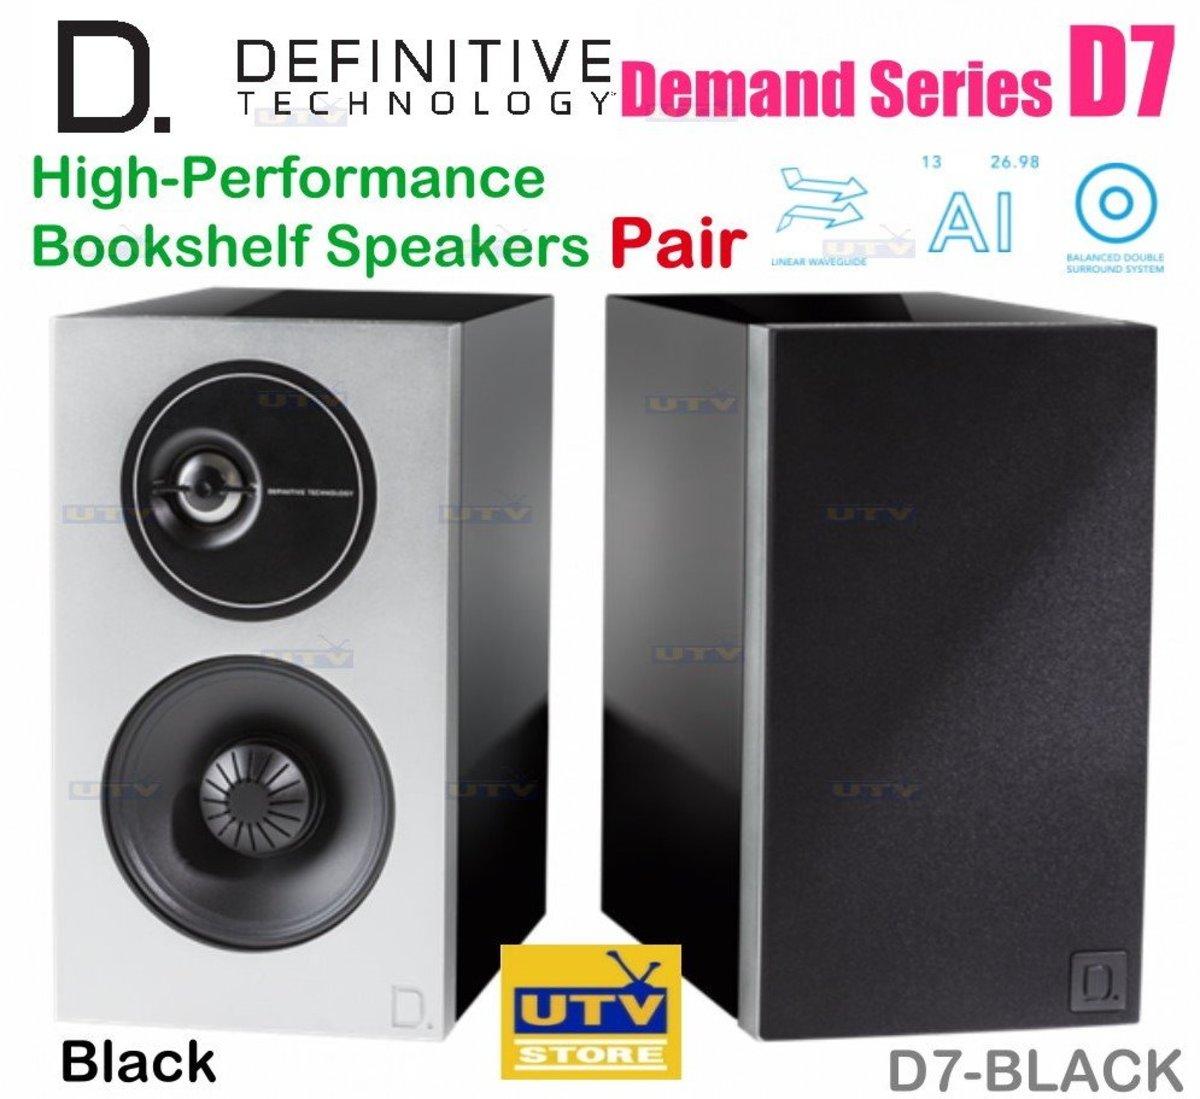 D7 Definitive High-Performance Bookshelf Speakers (BLACK)